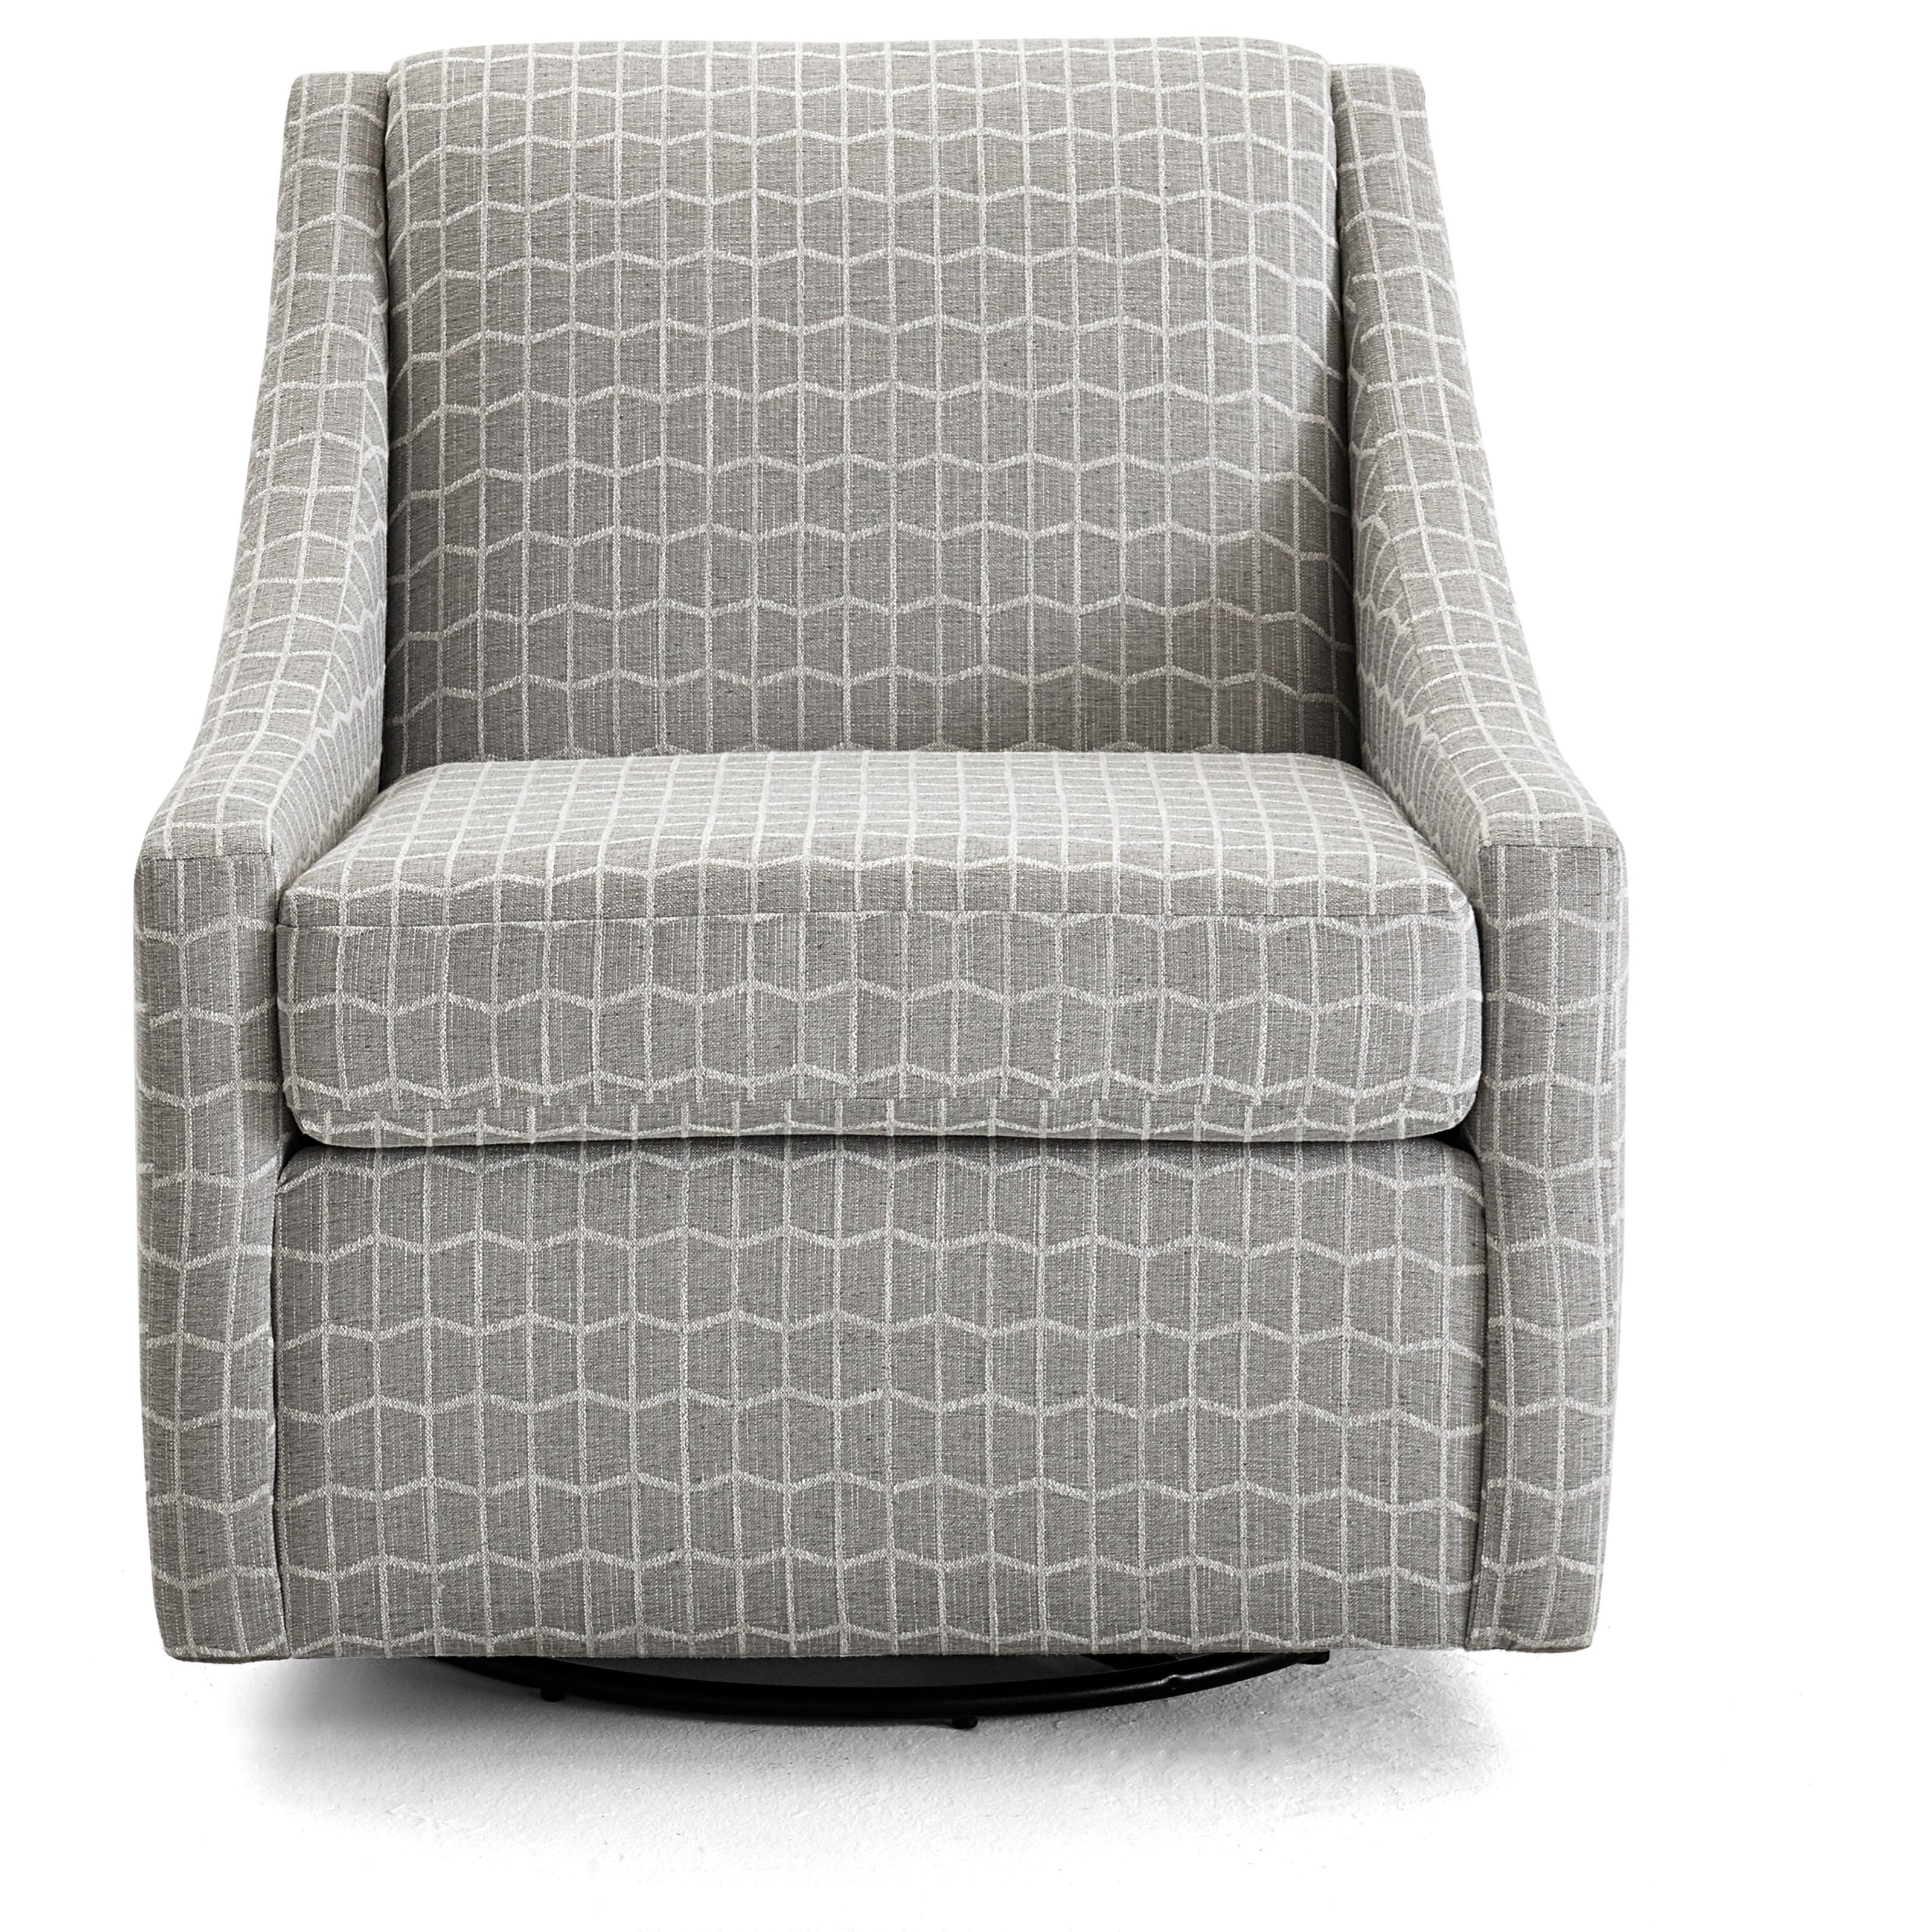 Regan Swivel Glider Chair by Best Home Furnishings at Walker's Furniture